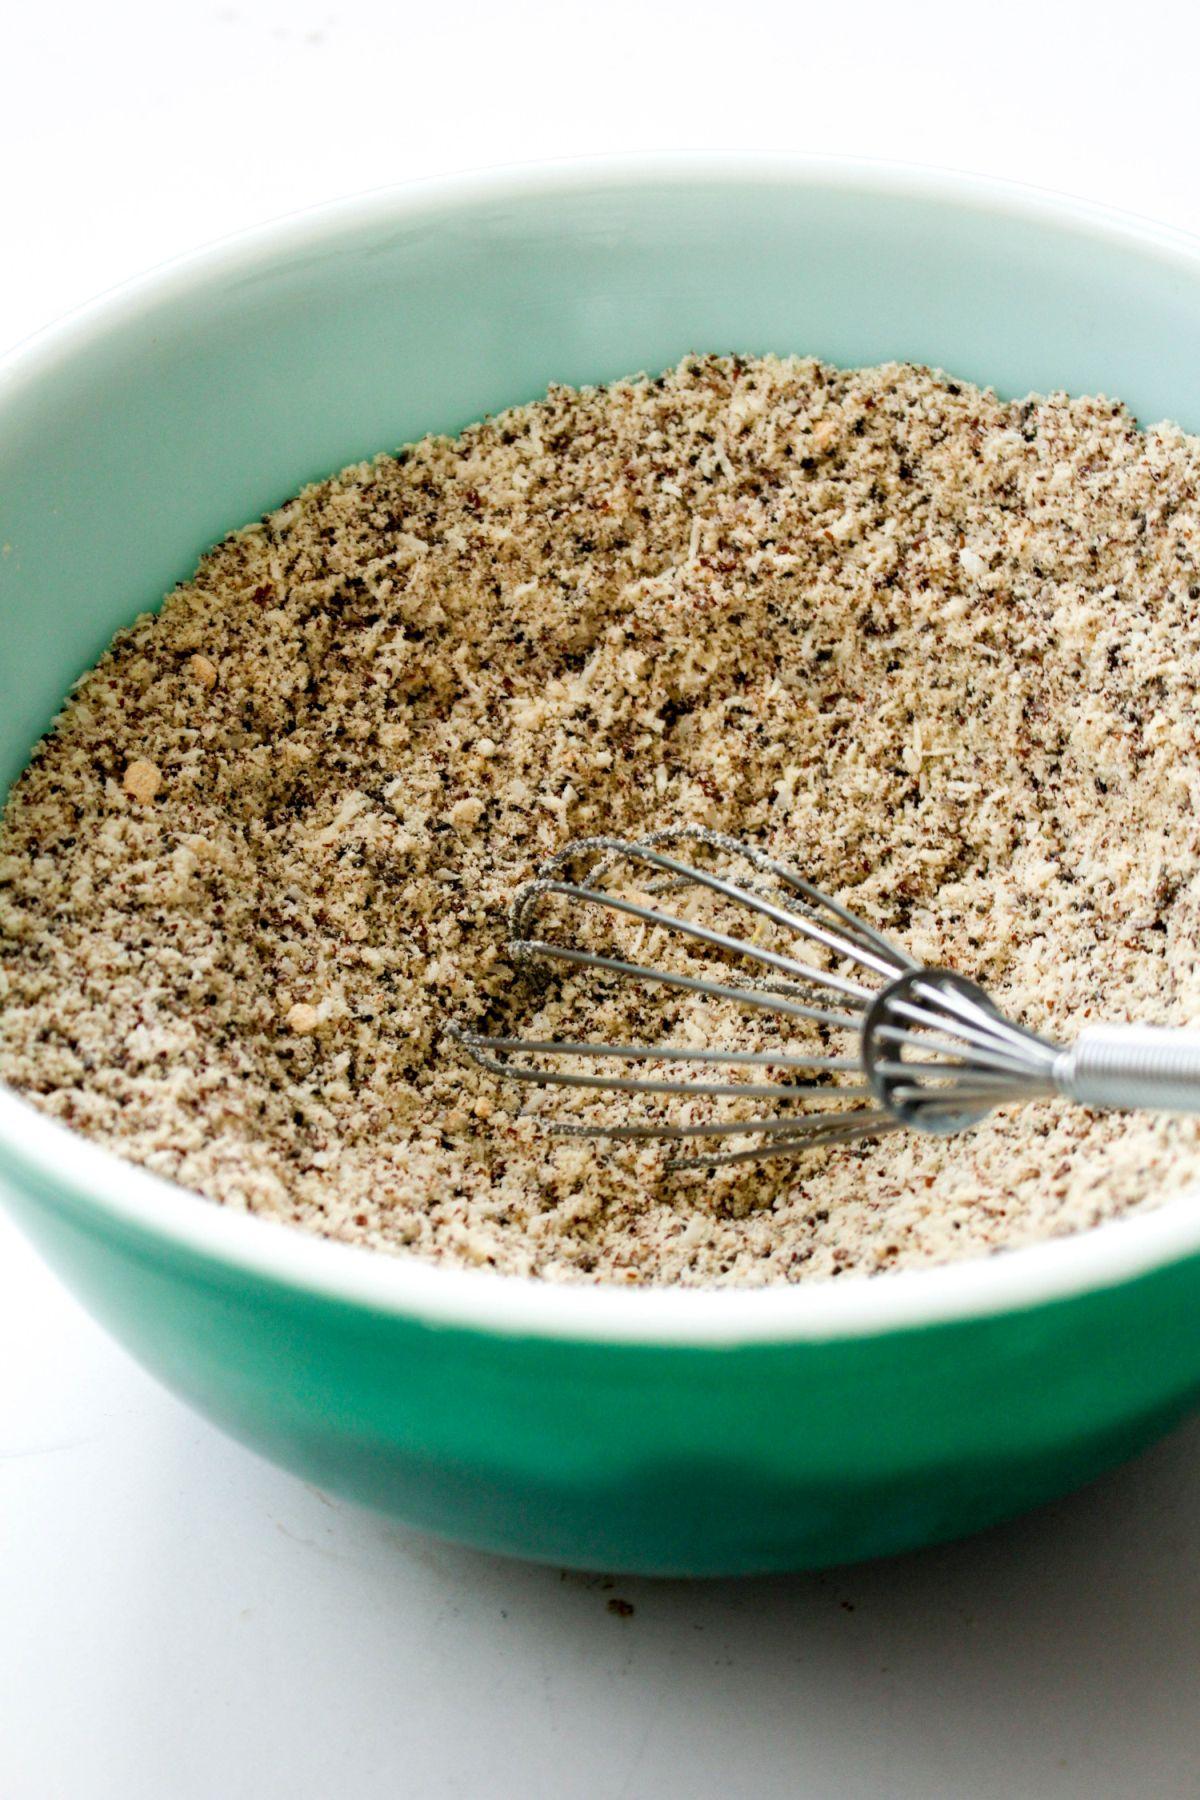 Almond joy protein bars mix ingredients